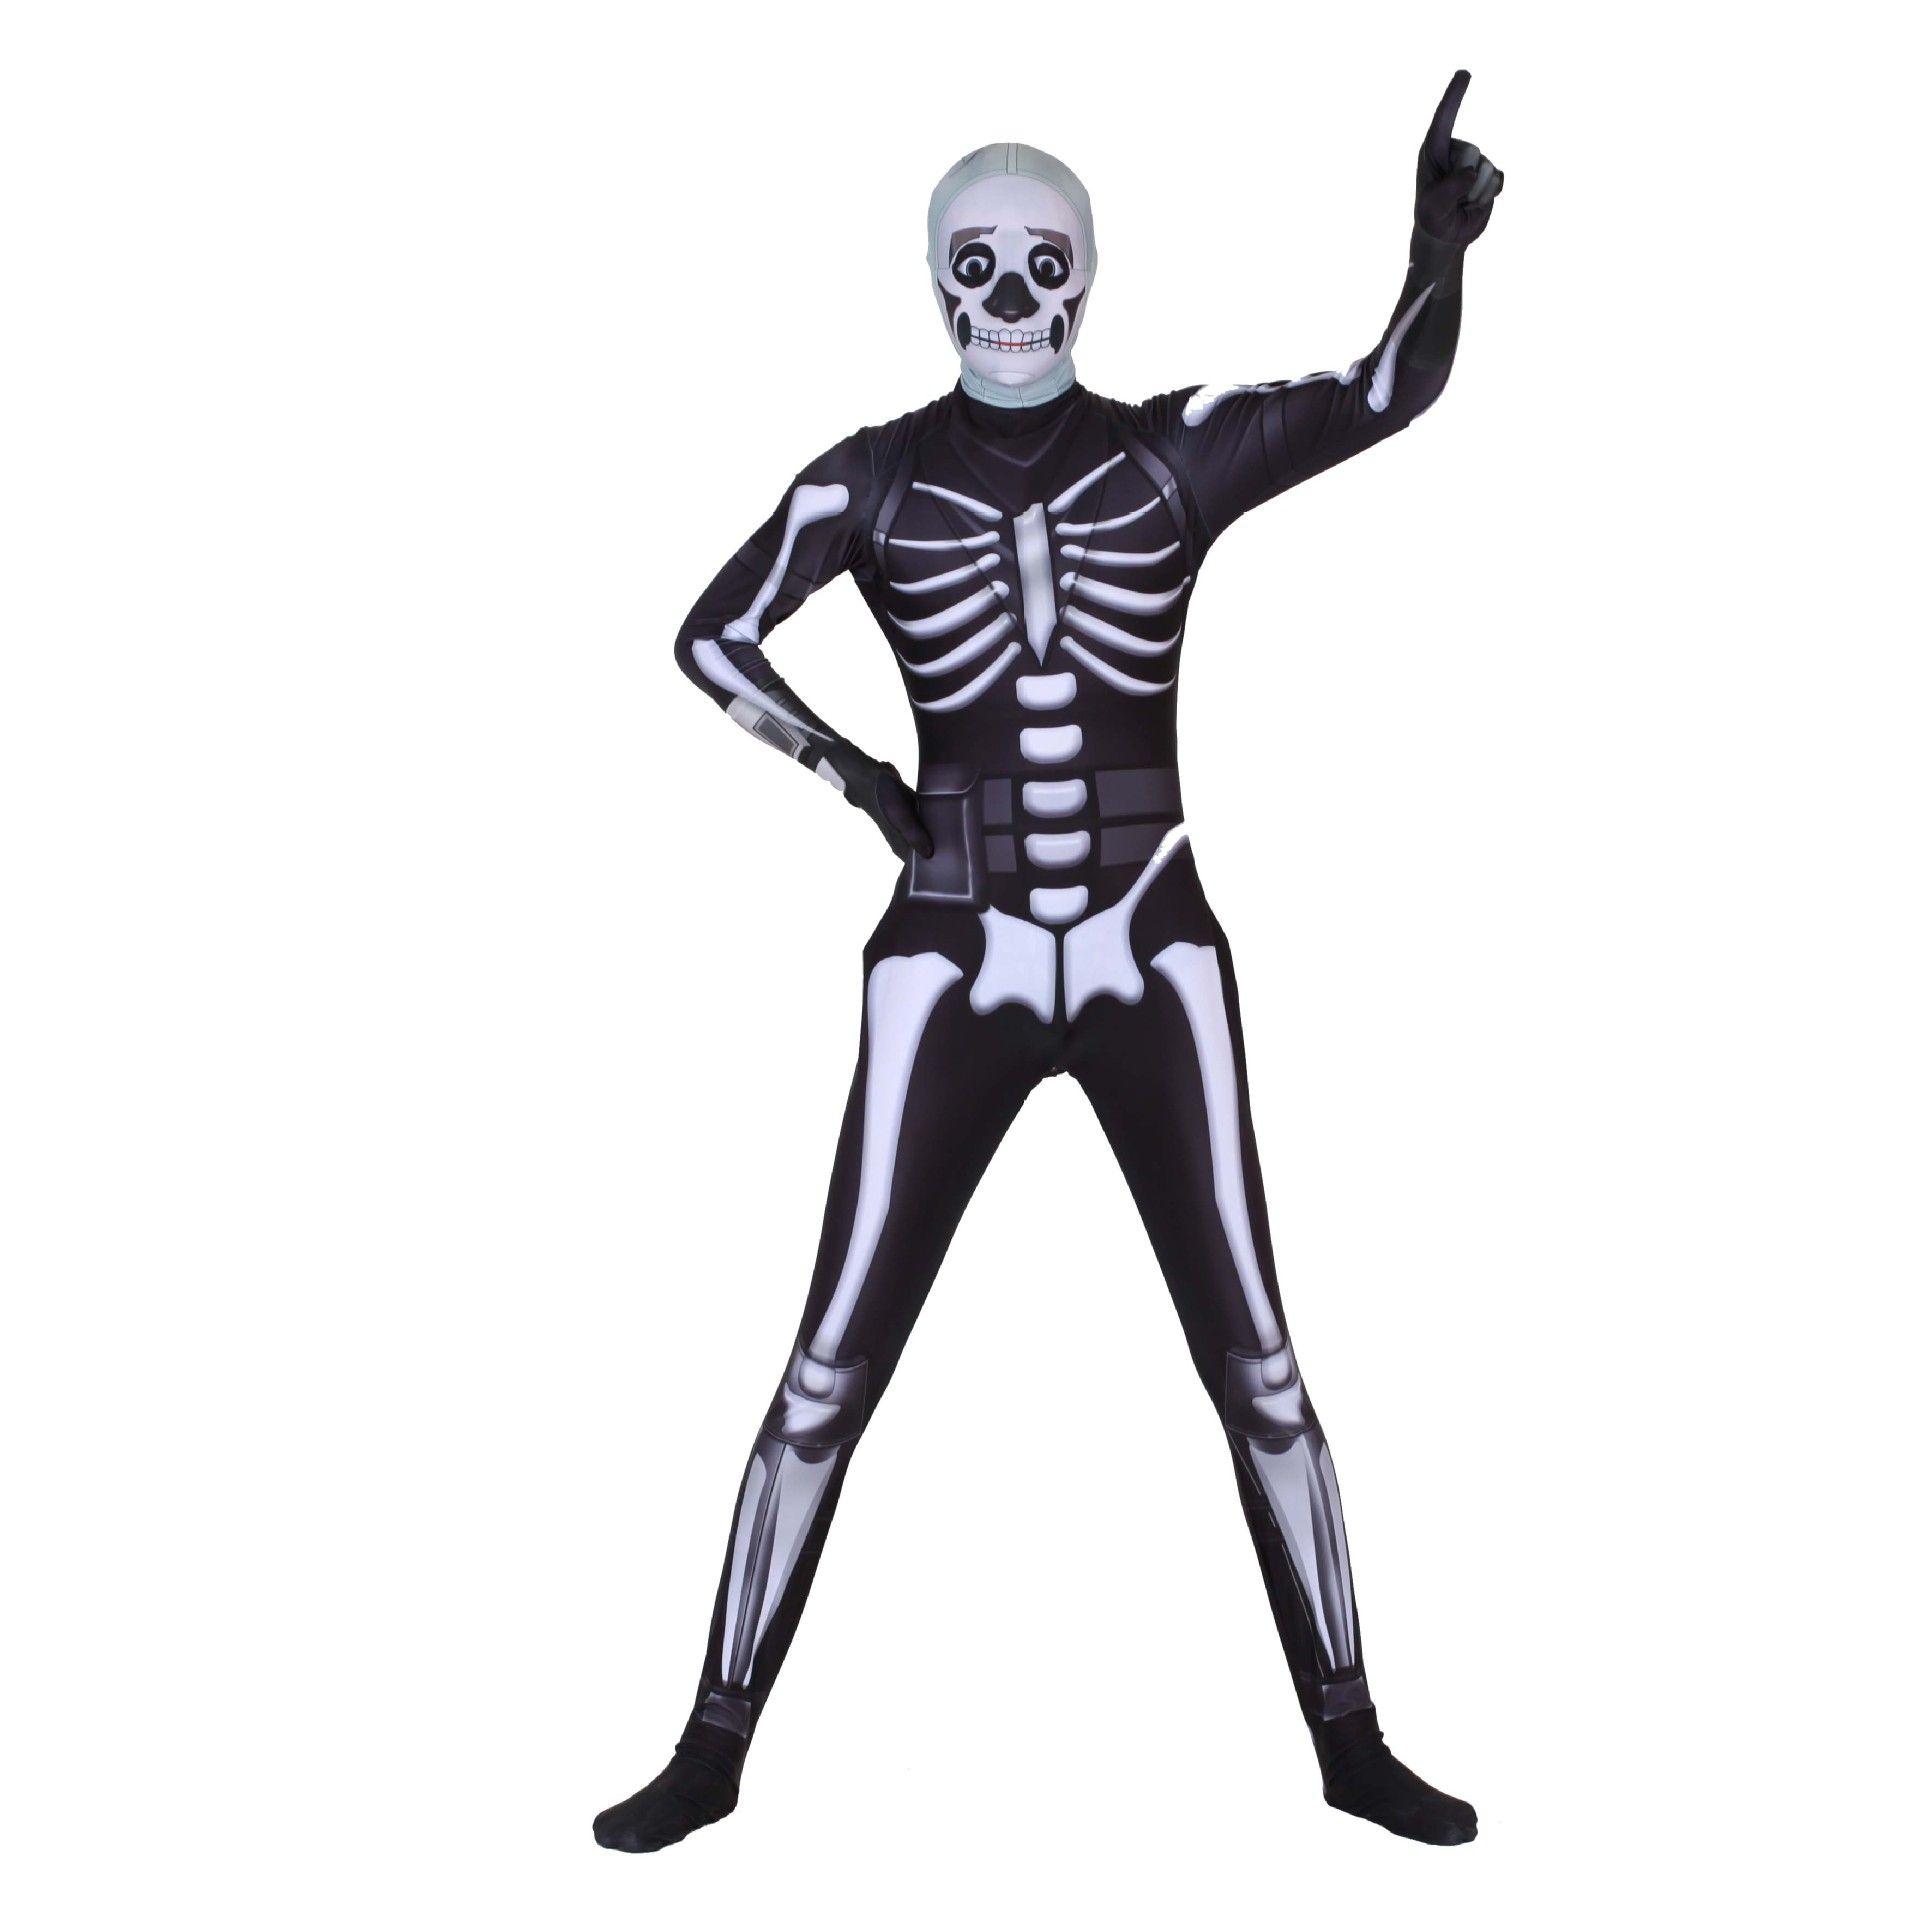 Cosplay ghost face warrior skull trooper costumes Toddler zipper Lycra Jumpsuits Body suit/mask adult Halloween horror costume men/women